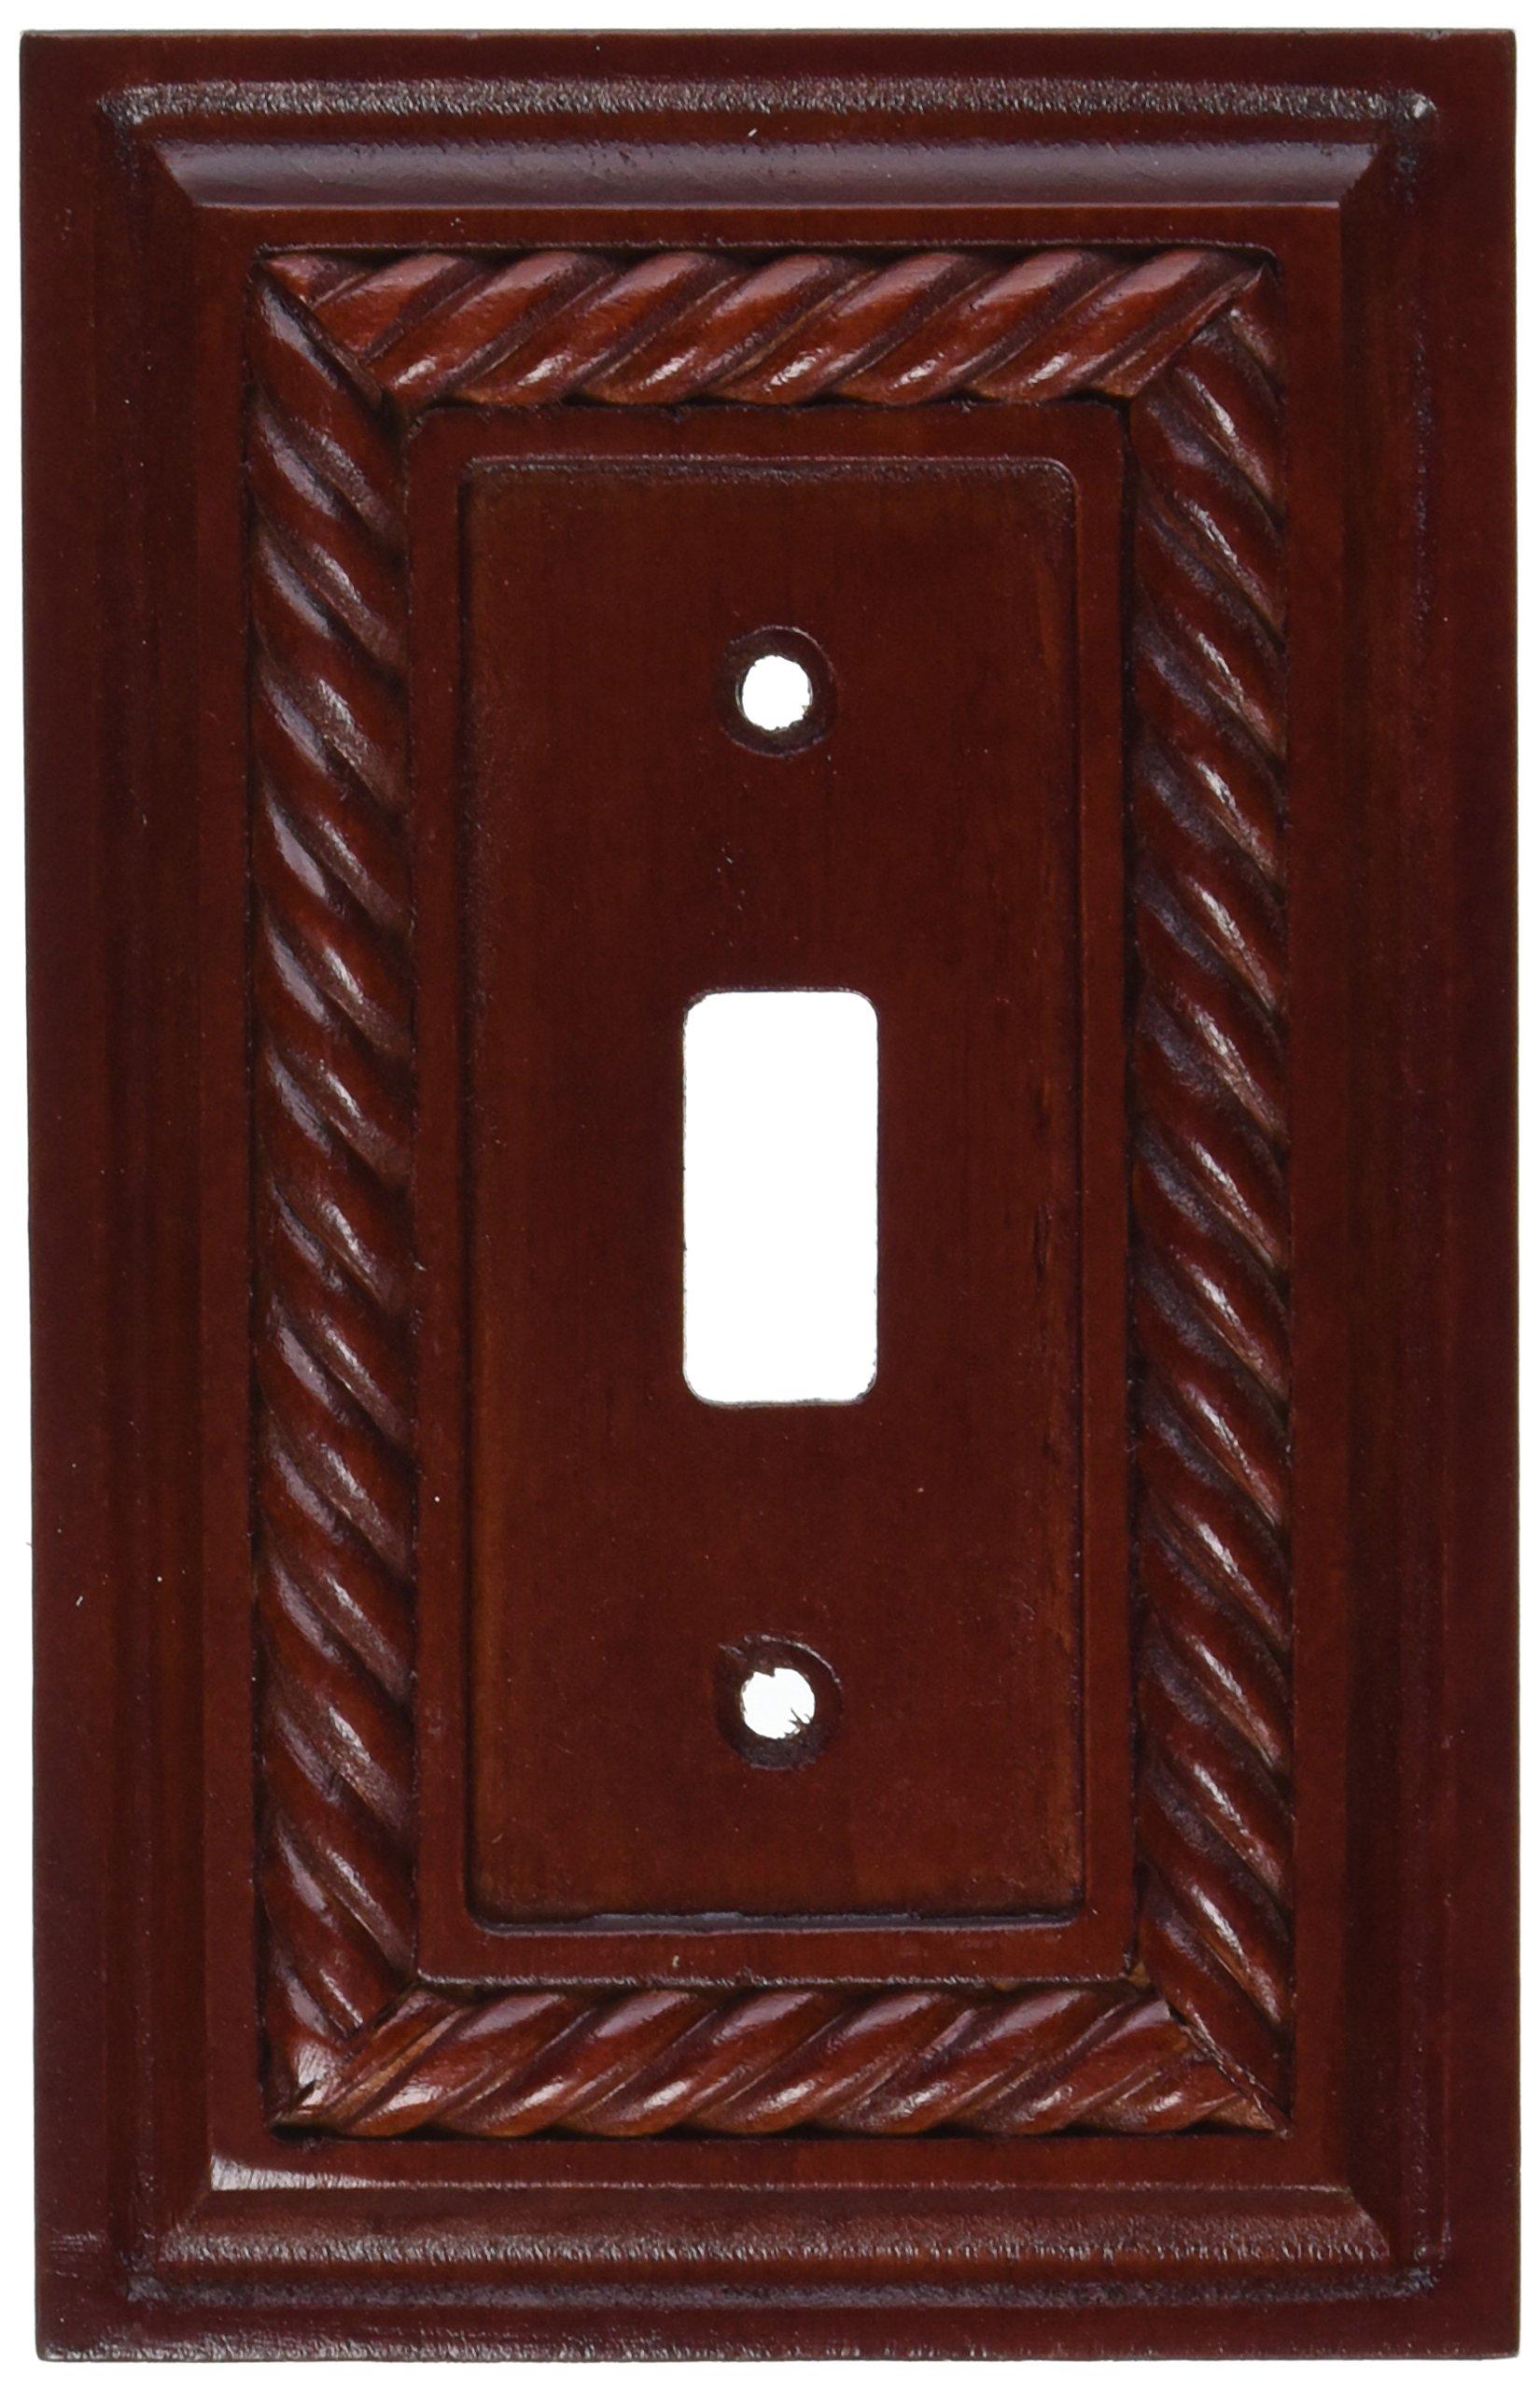 Amerelle 4011TML Toggle Rope Wood Wall Plate, Mahogany Finish